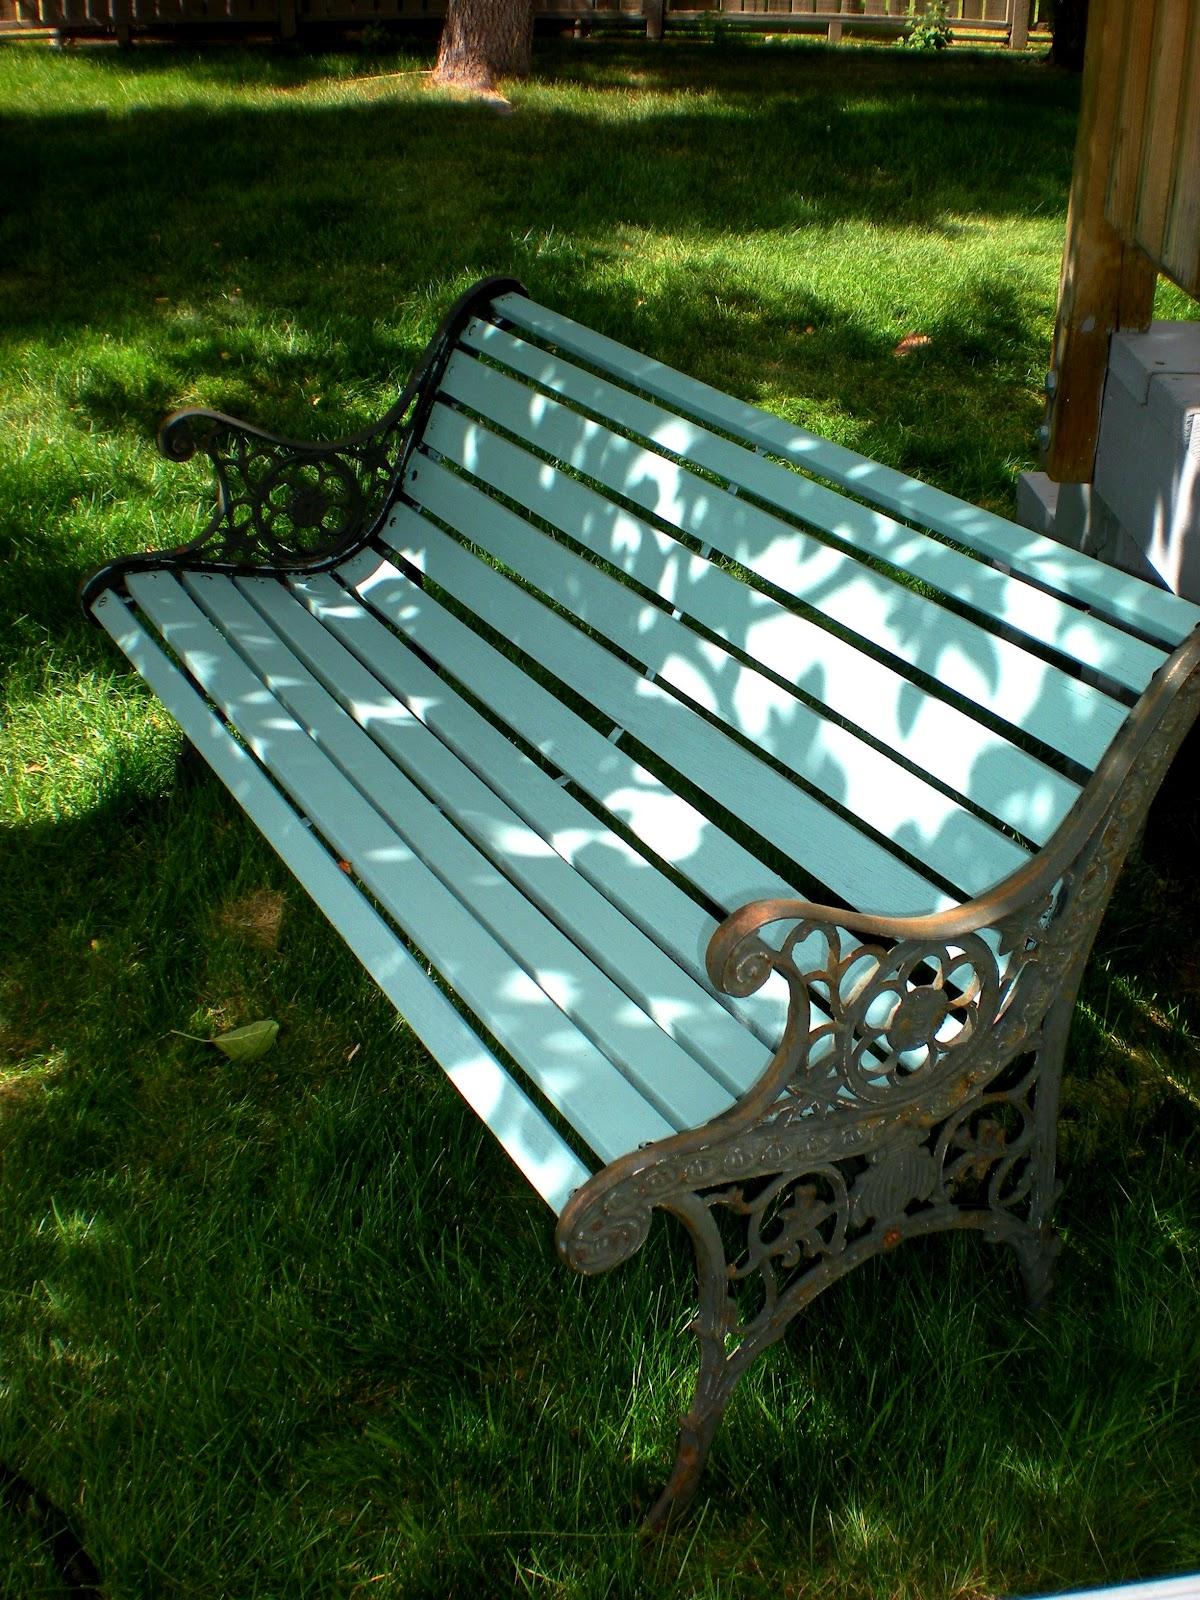 Painted Bench Ideas Part - 38: Design Dreams By Anne - Blogspot